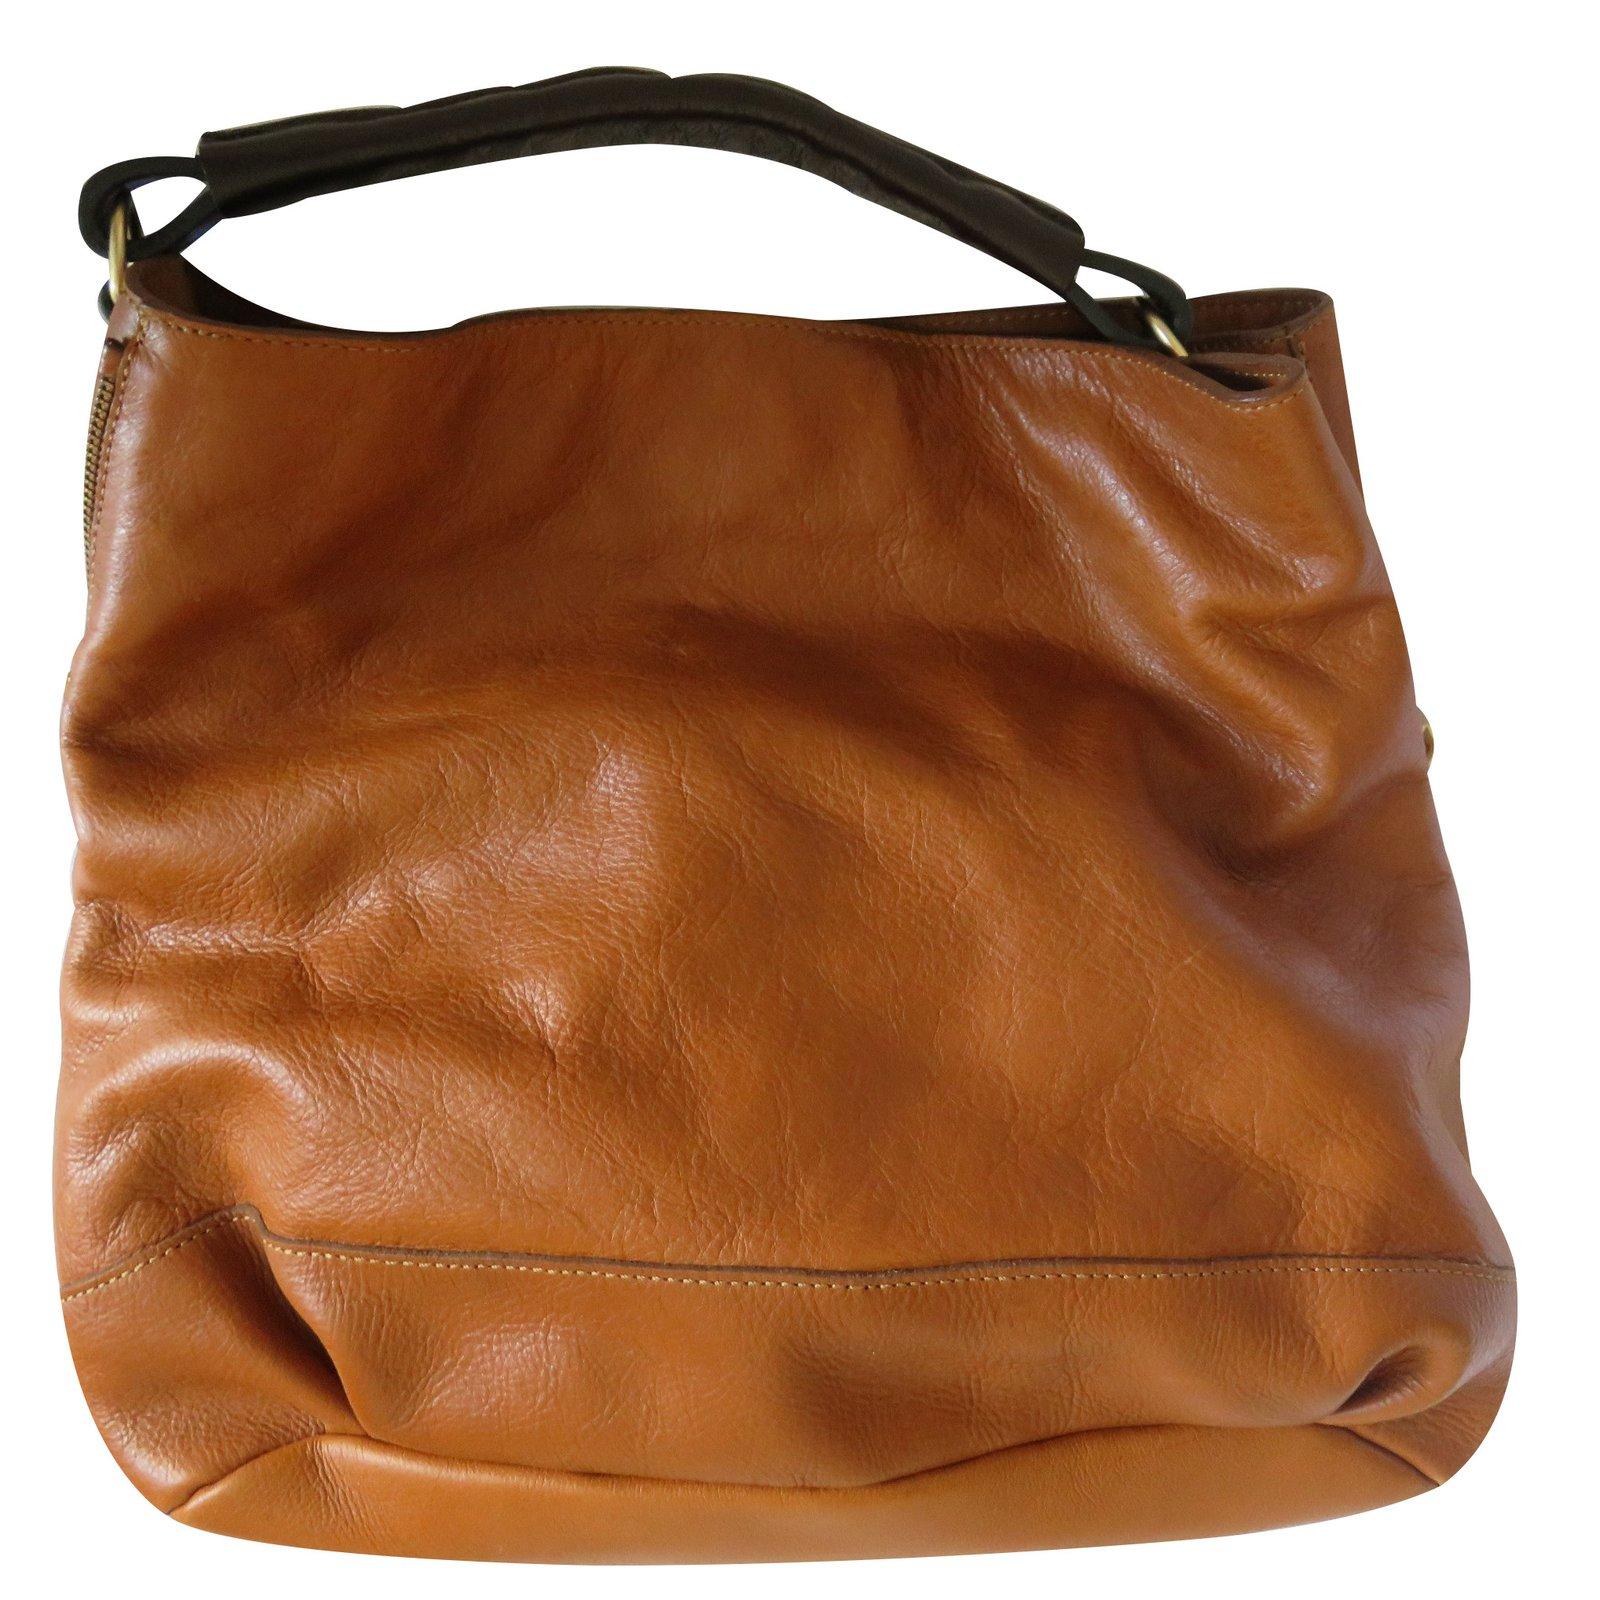 ea2f8725a046 Massimo Dutti Handbag Handbags Leather Caramel Ref 22890 Joli Closet